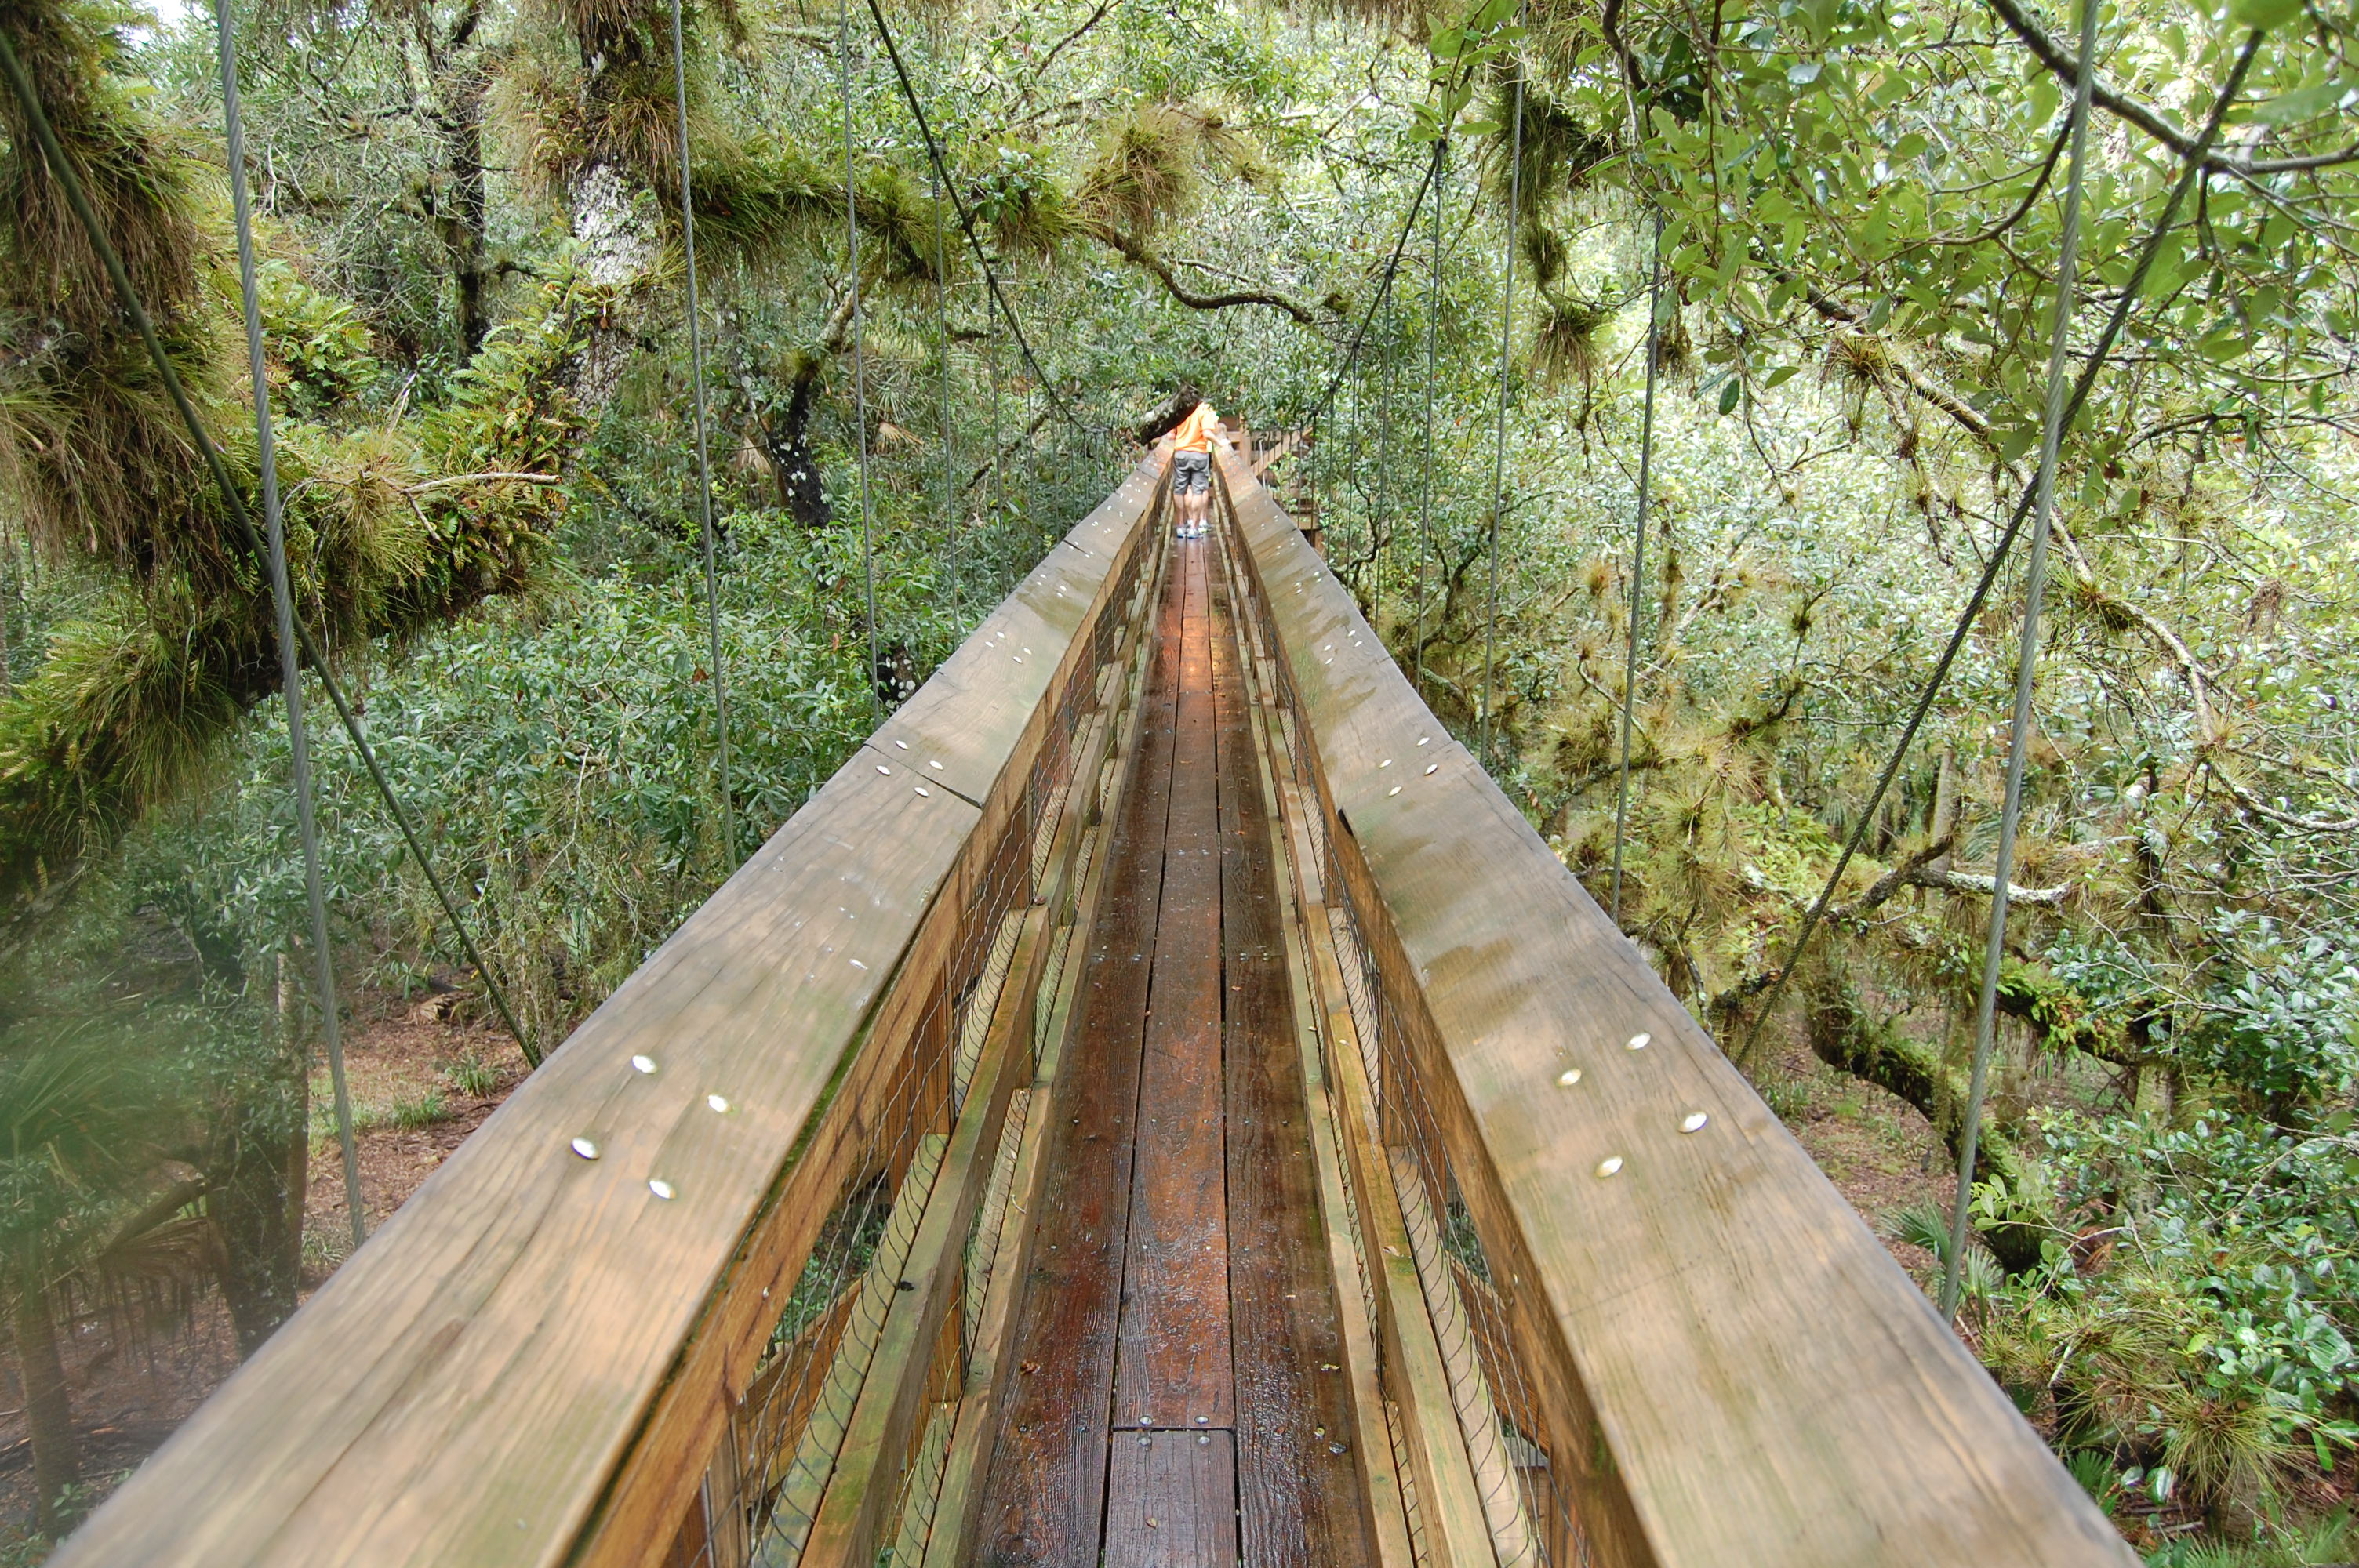 FileMyakka Canopy Walkway.JPG & File:Myakka Canopy Walkway.JPG - Wikimedia Commons